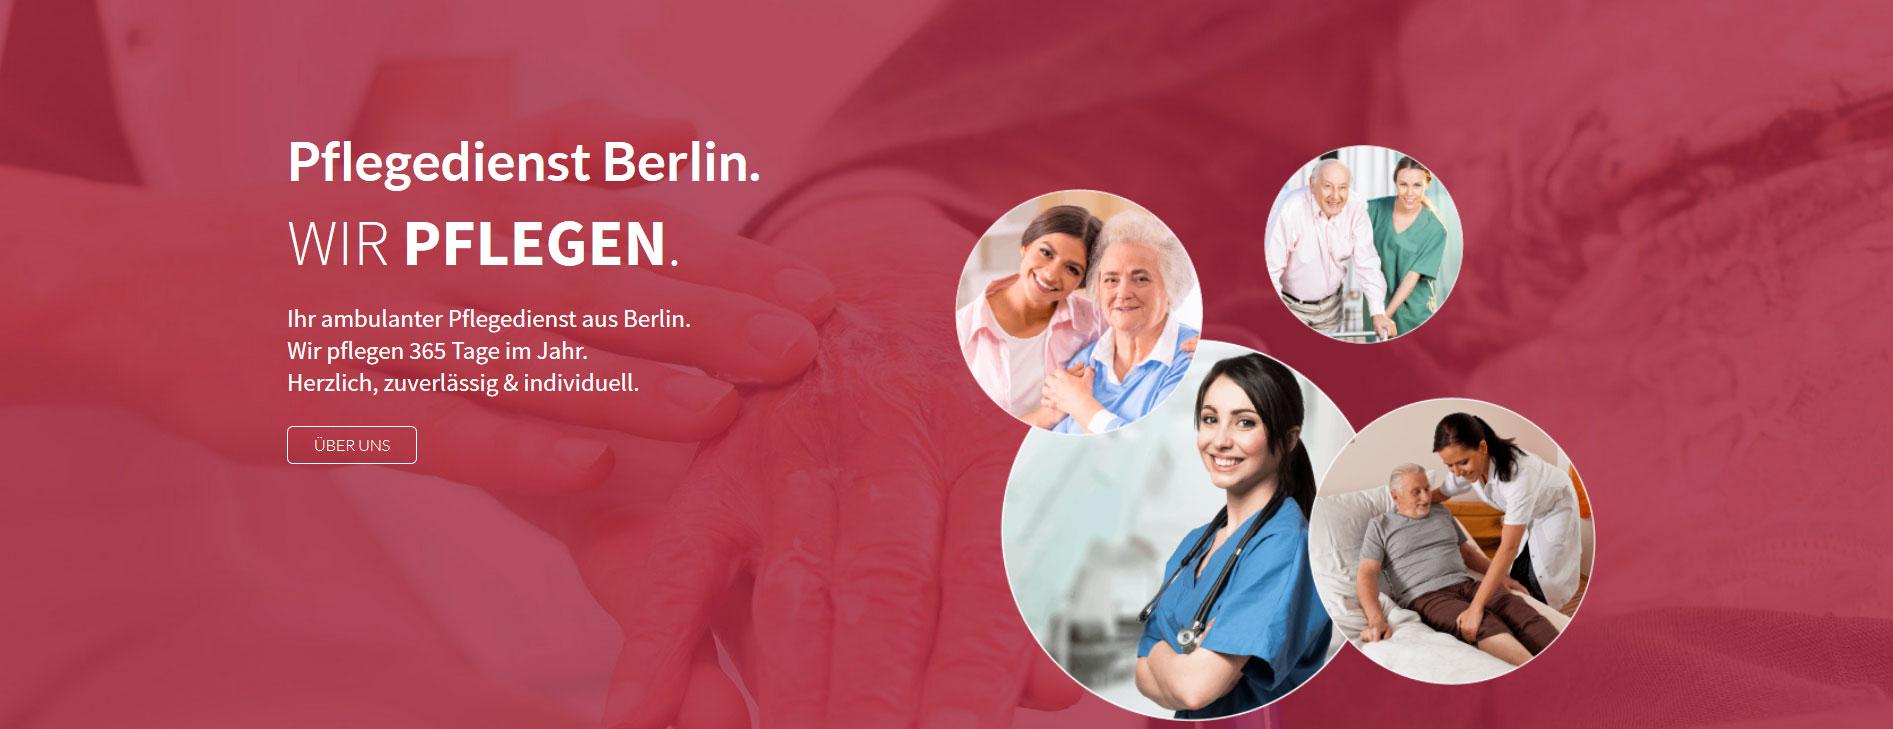 ambulanter pflegedienst berlin.jpg